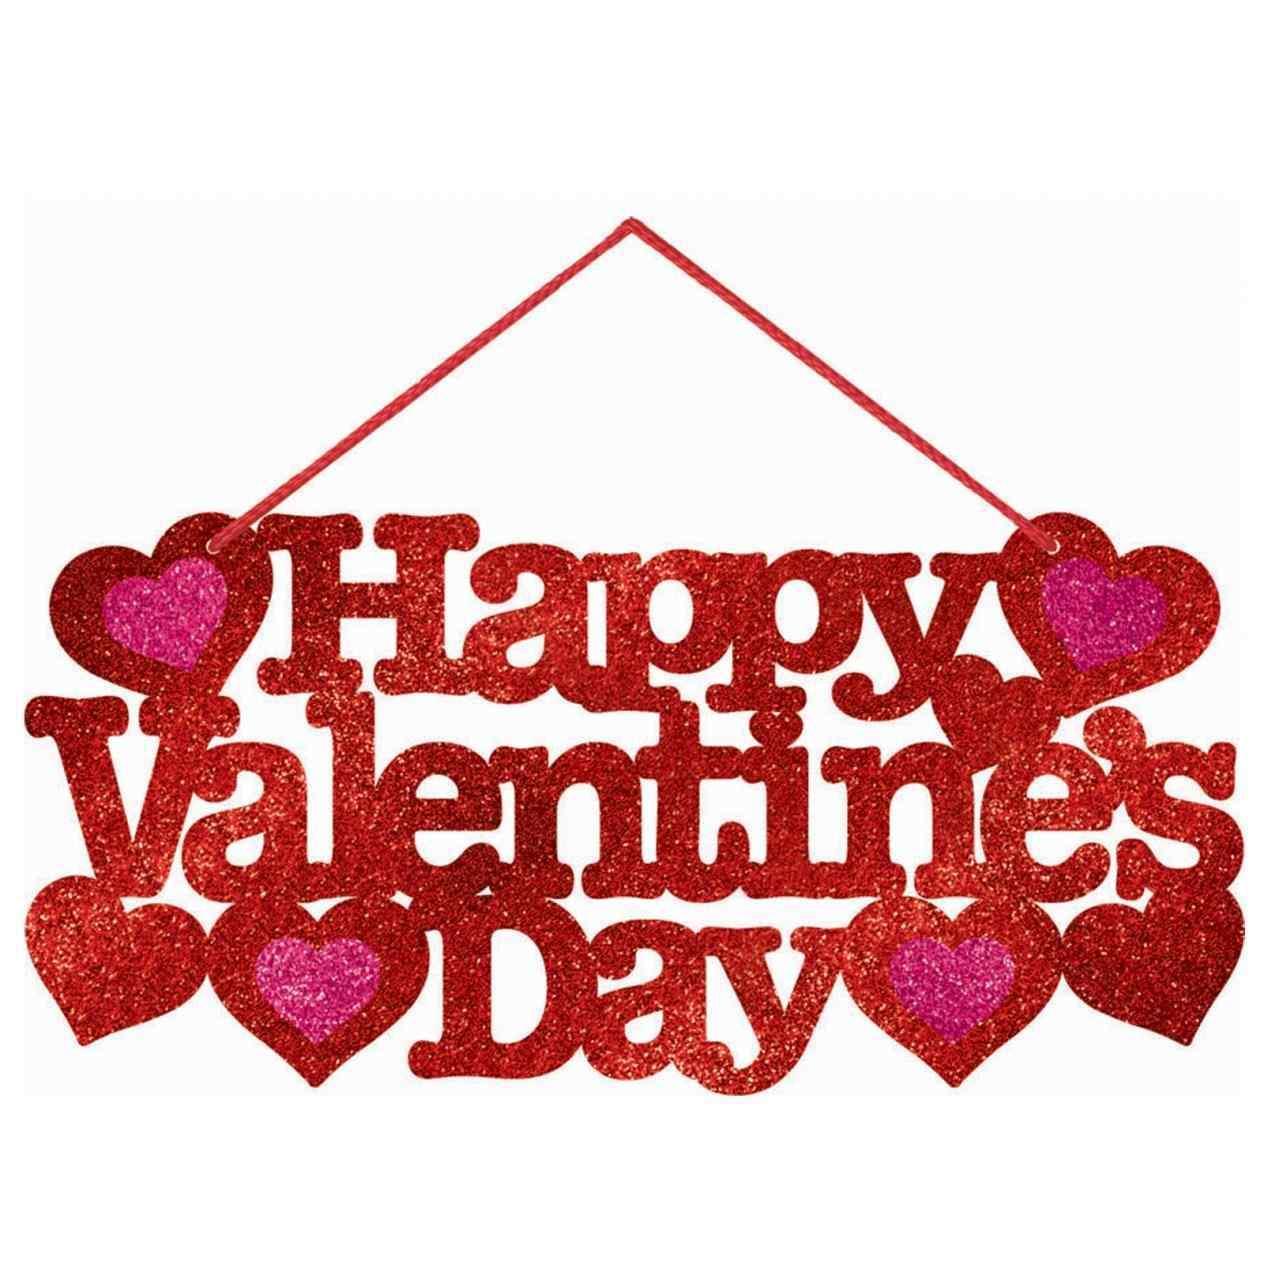 1264x1264 Download Clip Art Day Church Media Valentineus Videos Primary